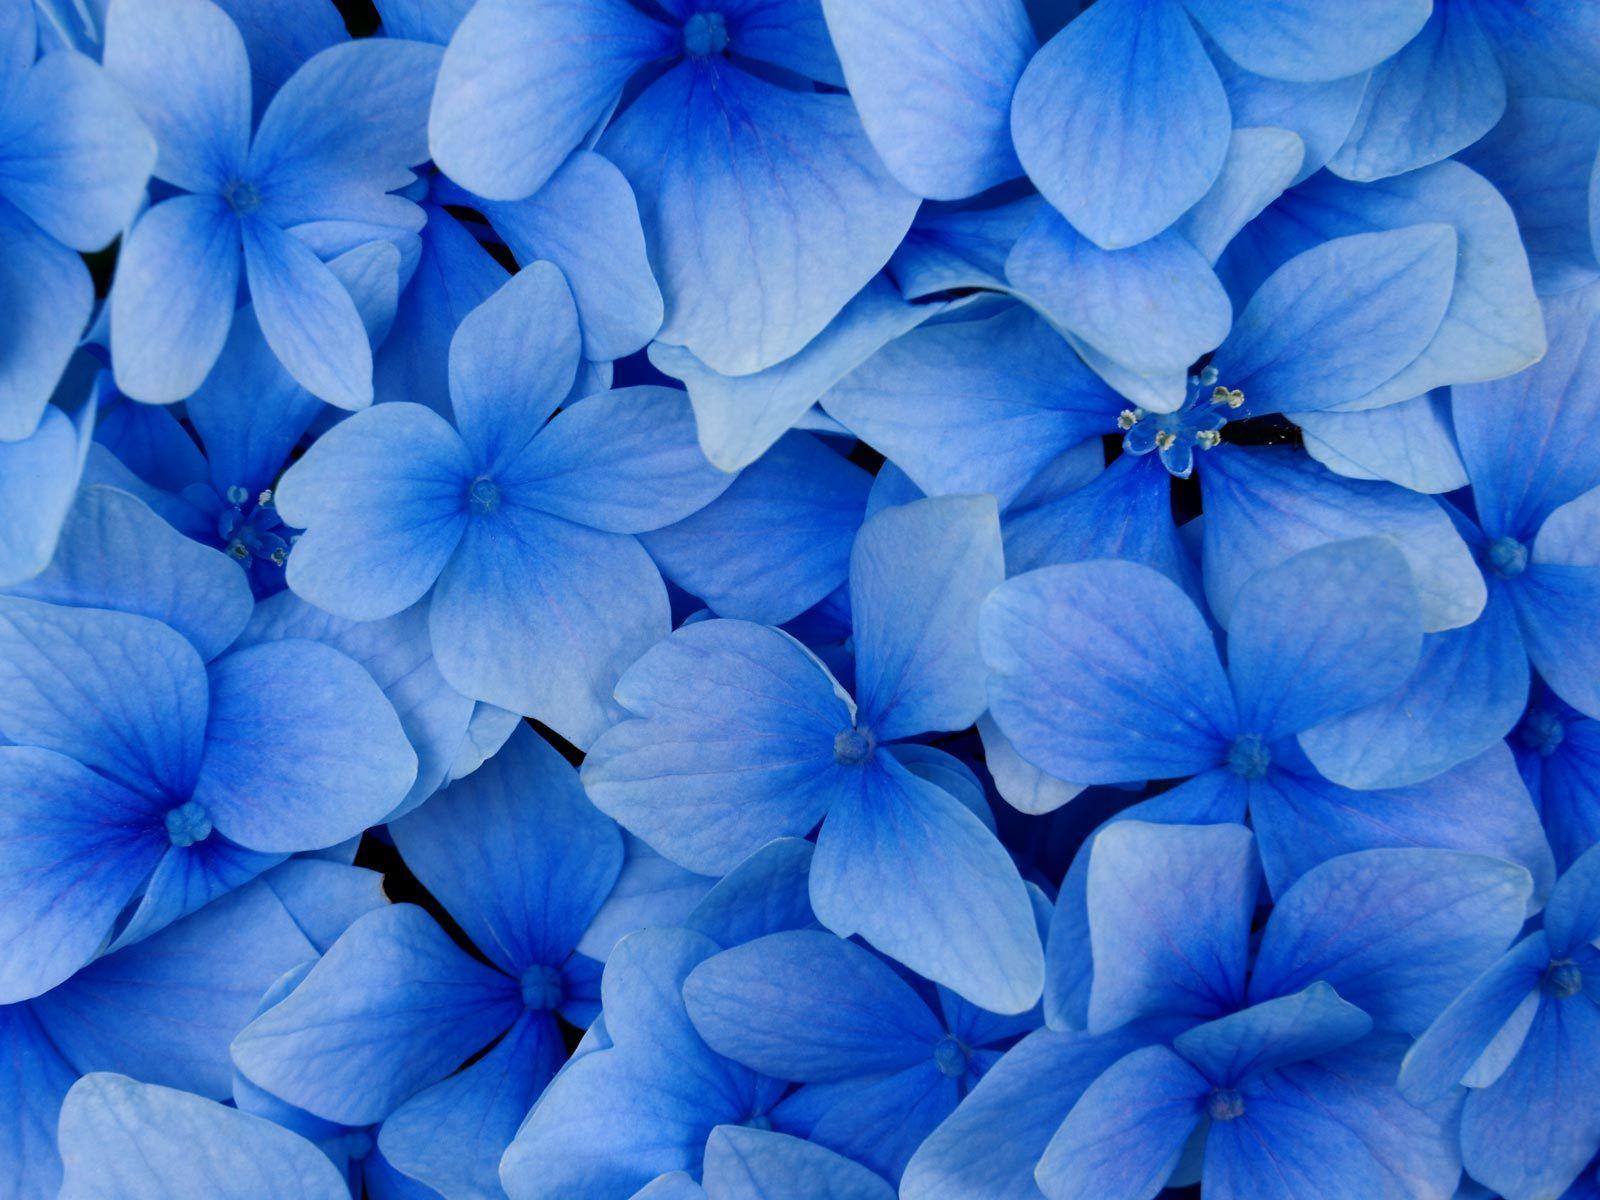 Flowers Pictures 1600 Series Iii Flowers Background 13682 Flower Background Flowers Blue Flower Wallpaper Blue Hydrangea Beautiful Flowers Wallpapers